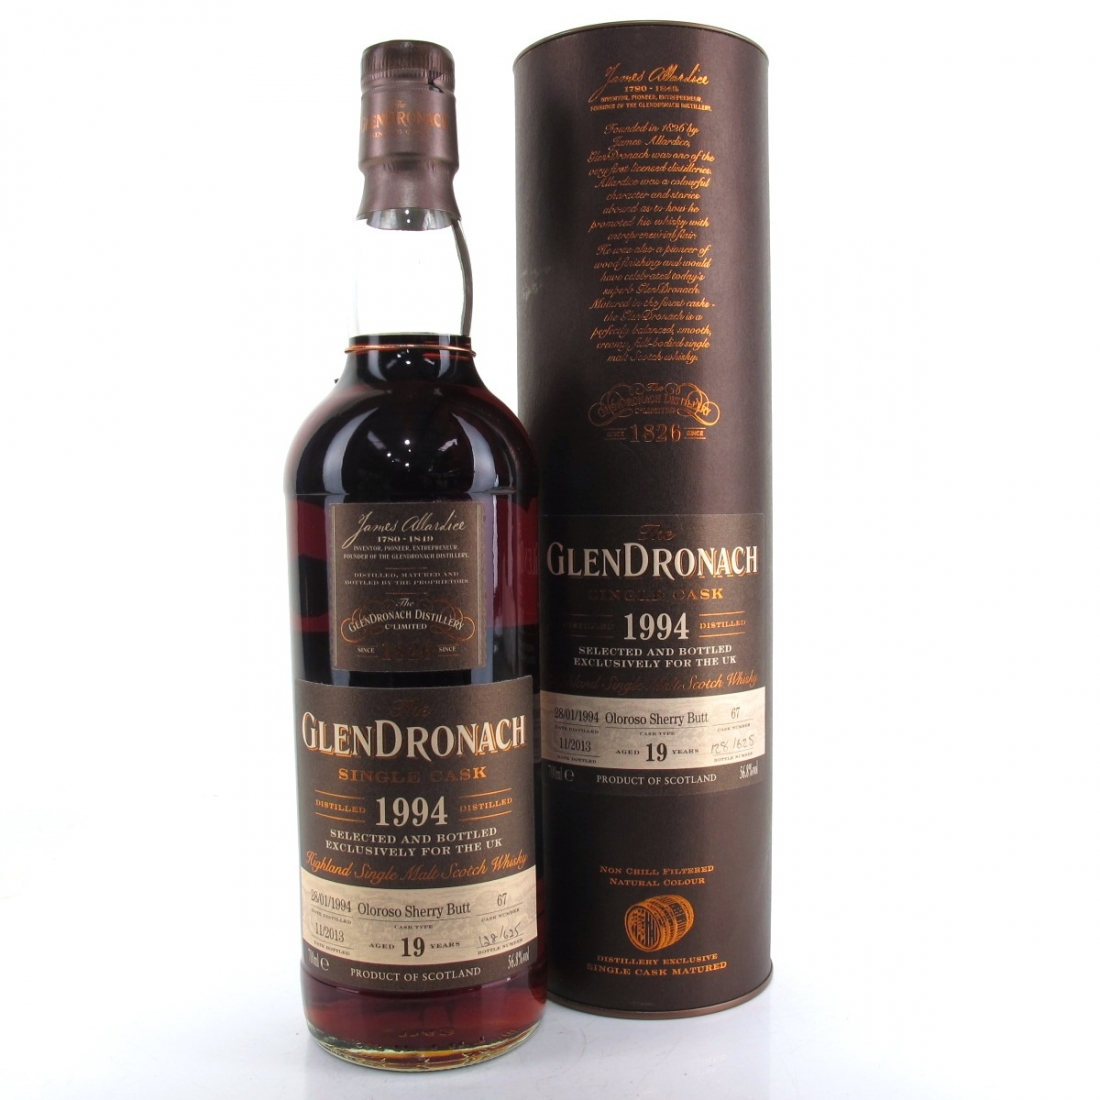 Glendronach 1994 Single Cask 19 Year Old #67